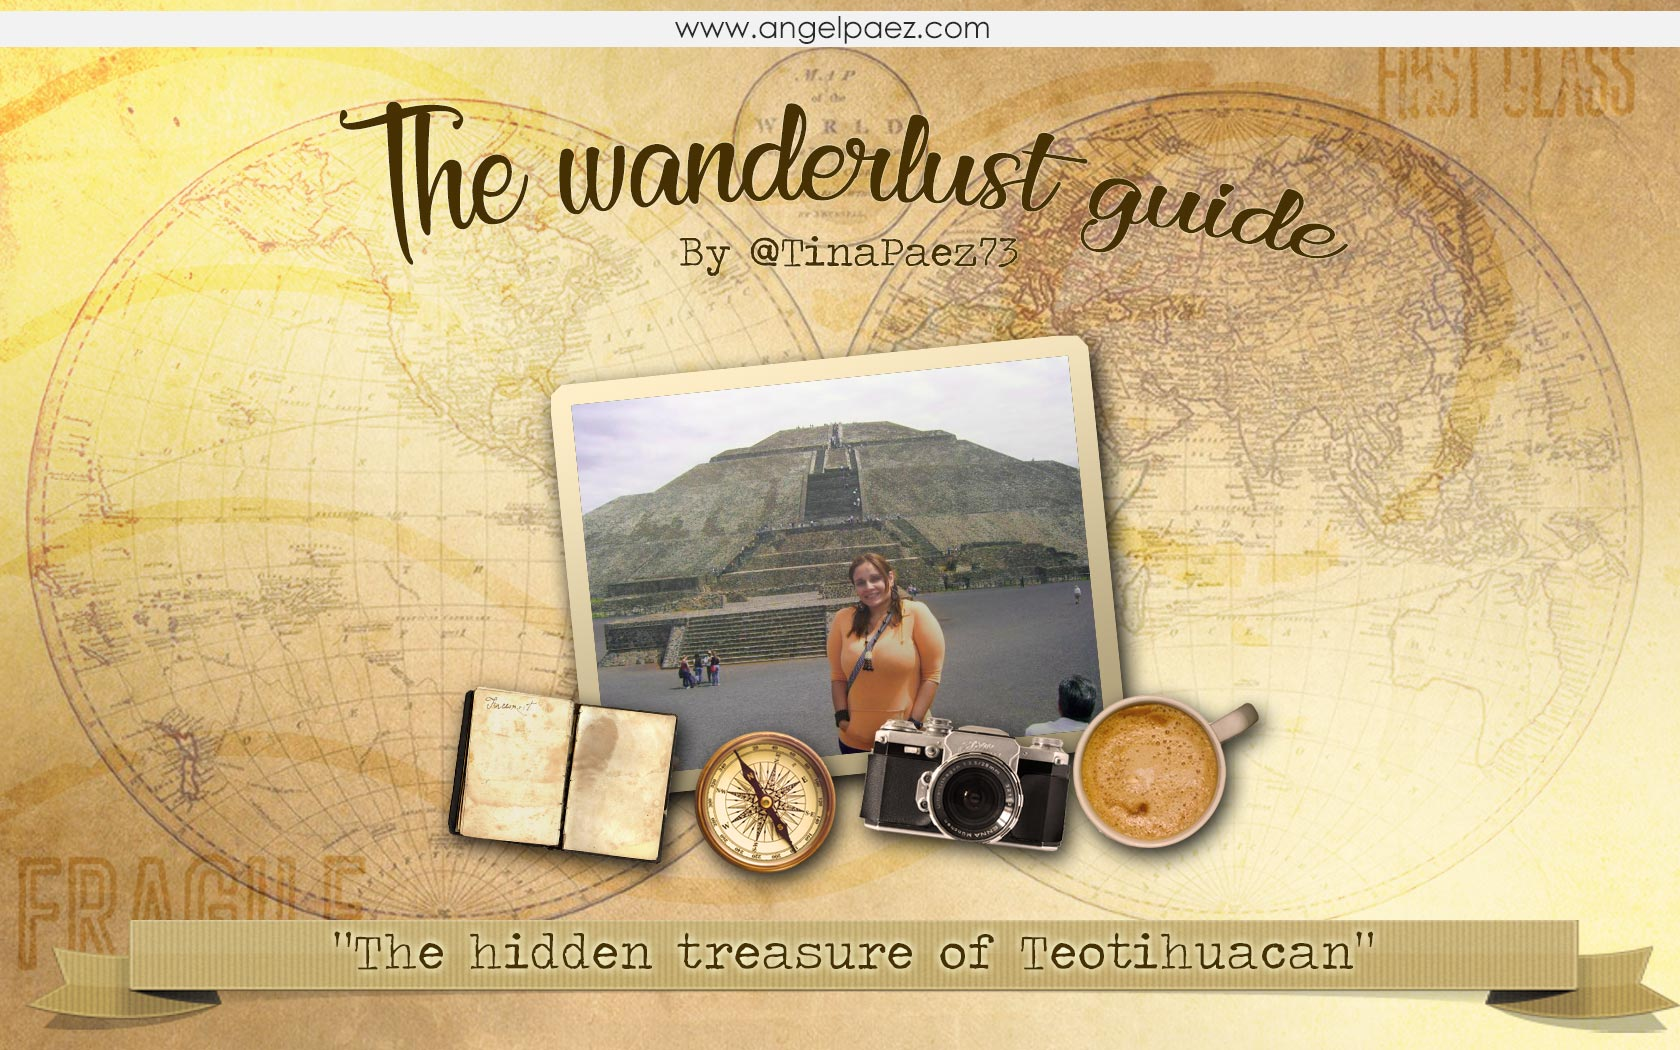 the hidden treasure of teotihuacan